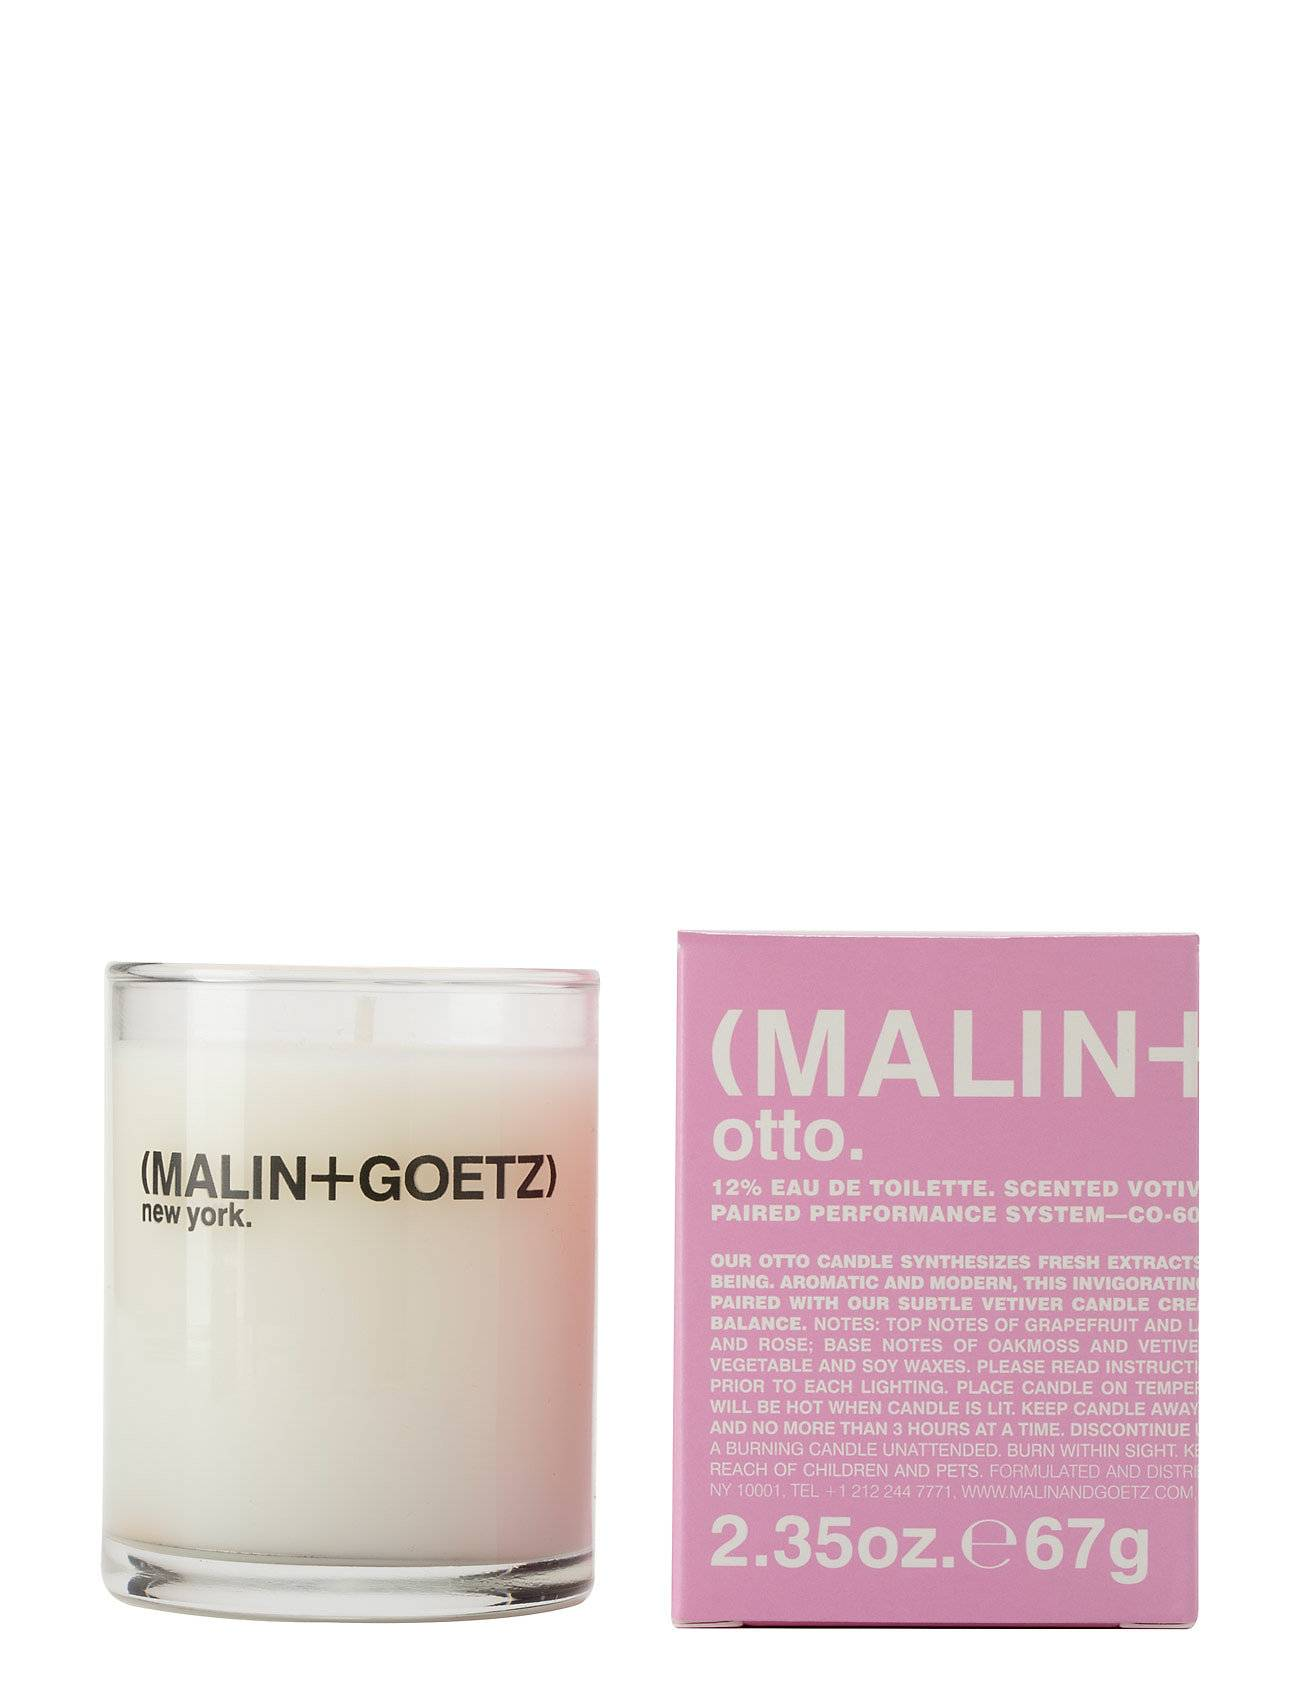 MALIN+GOETZ Otto Votive Candle Hajuvesi Parfyymi Nude MALIN+GOETZ